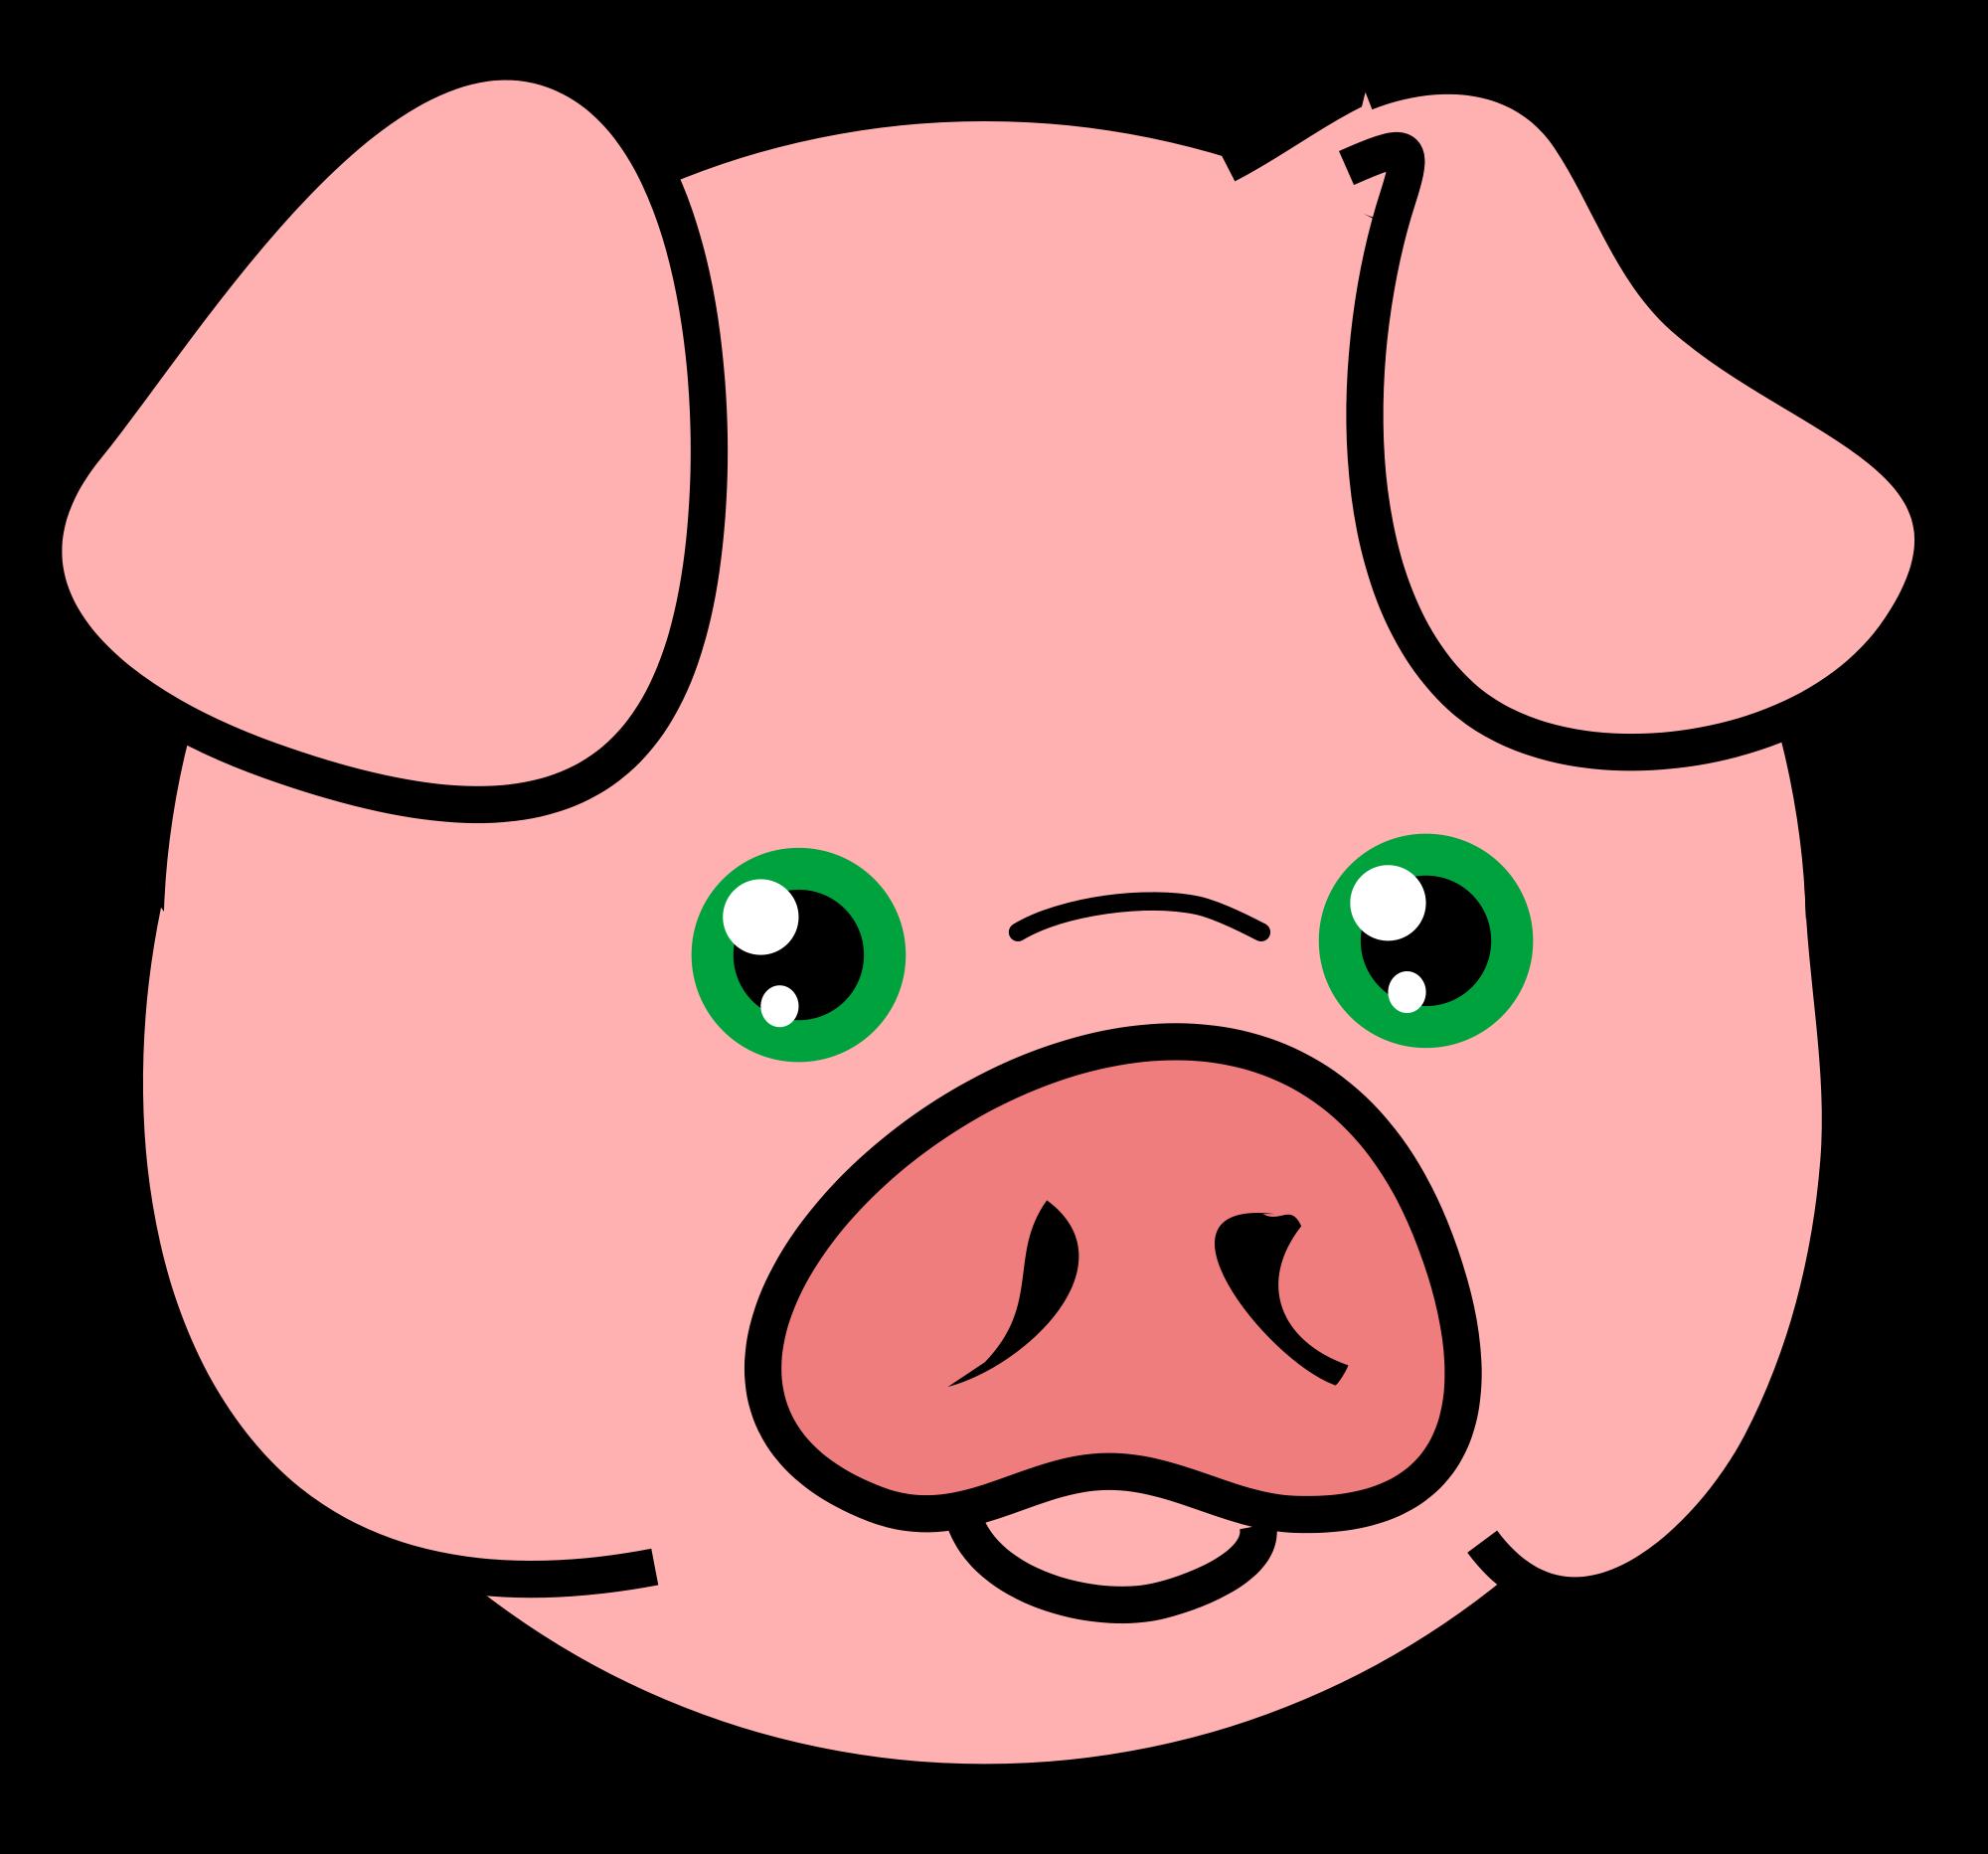 2000x1865 Pig Images Cartoon